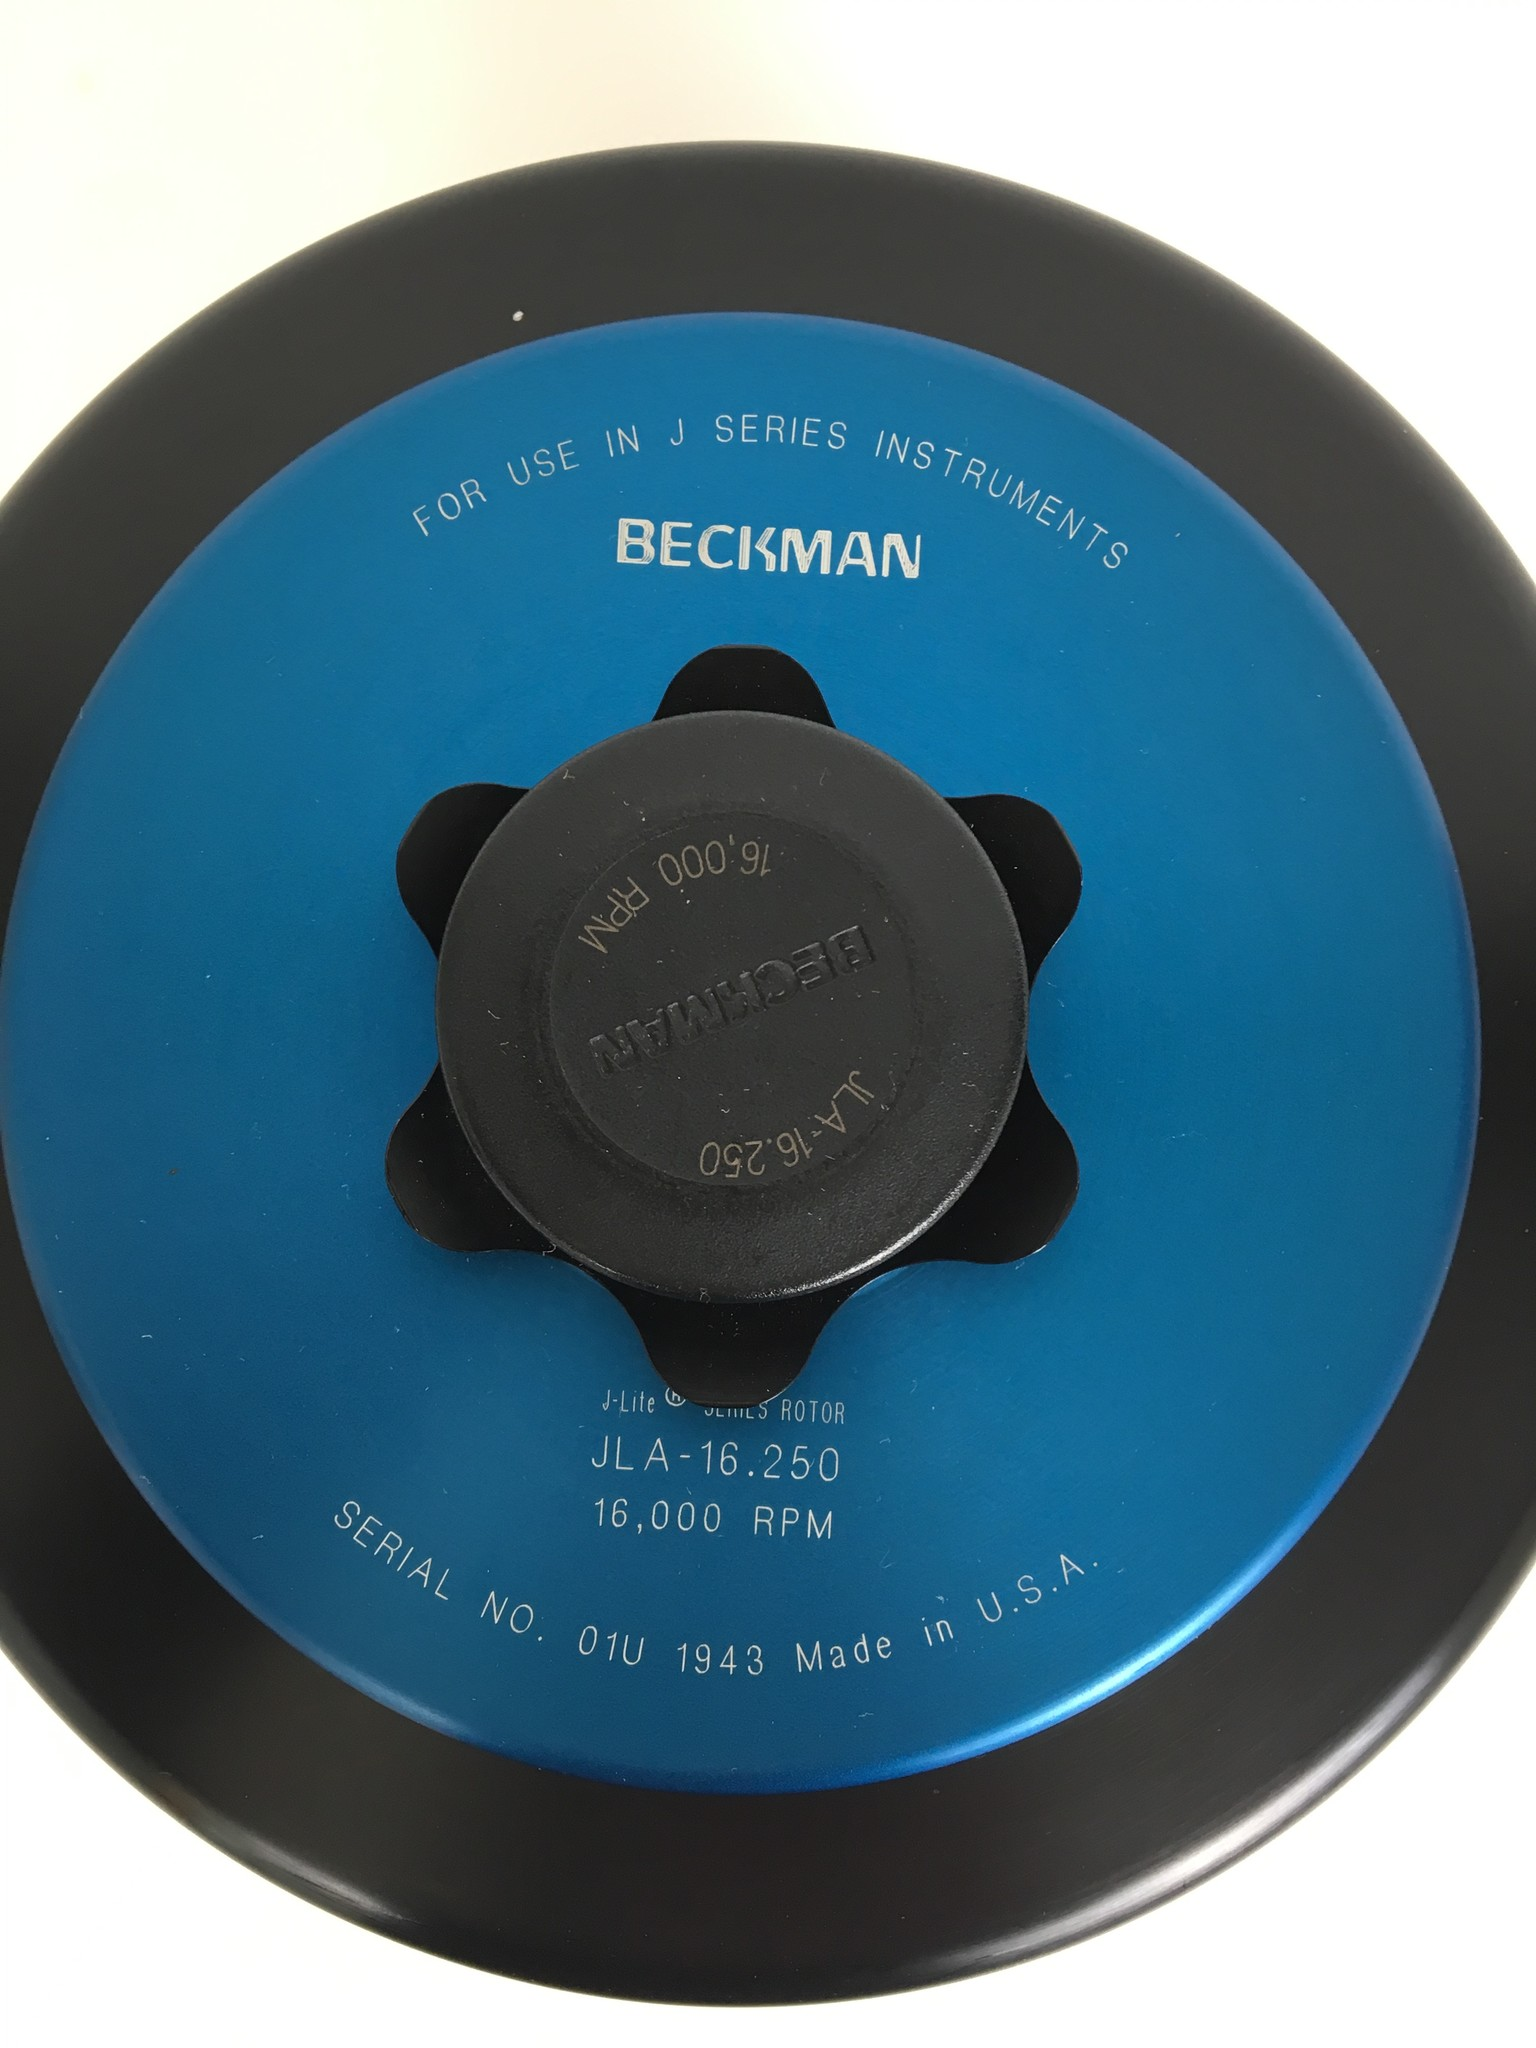 Beckman Beckman Rotor JLA-16.250